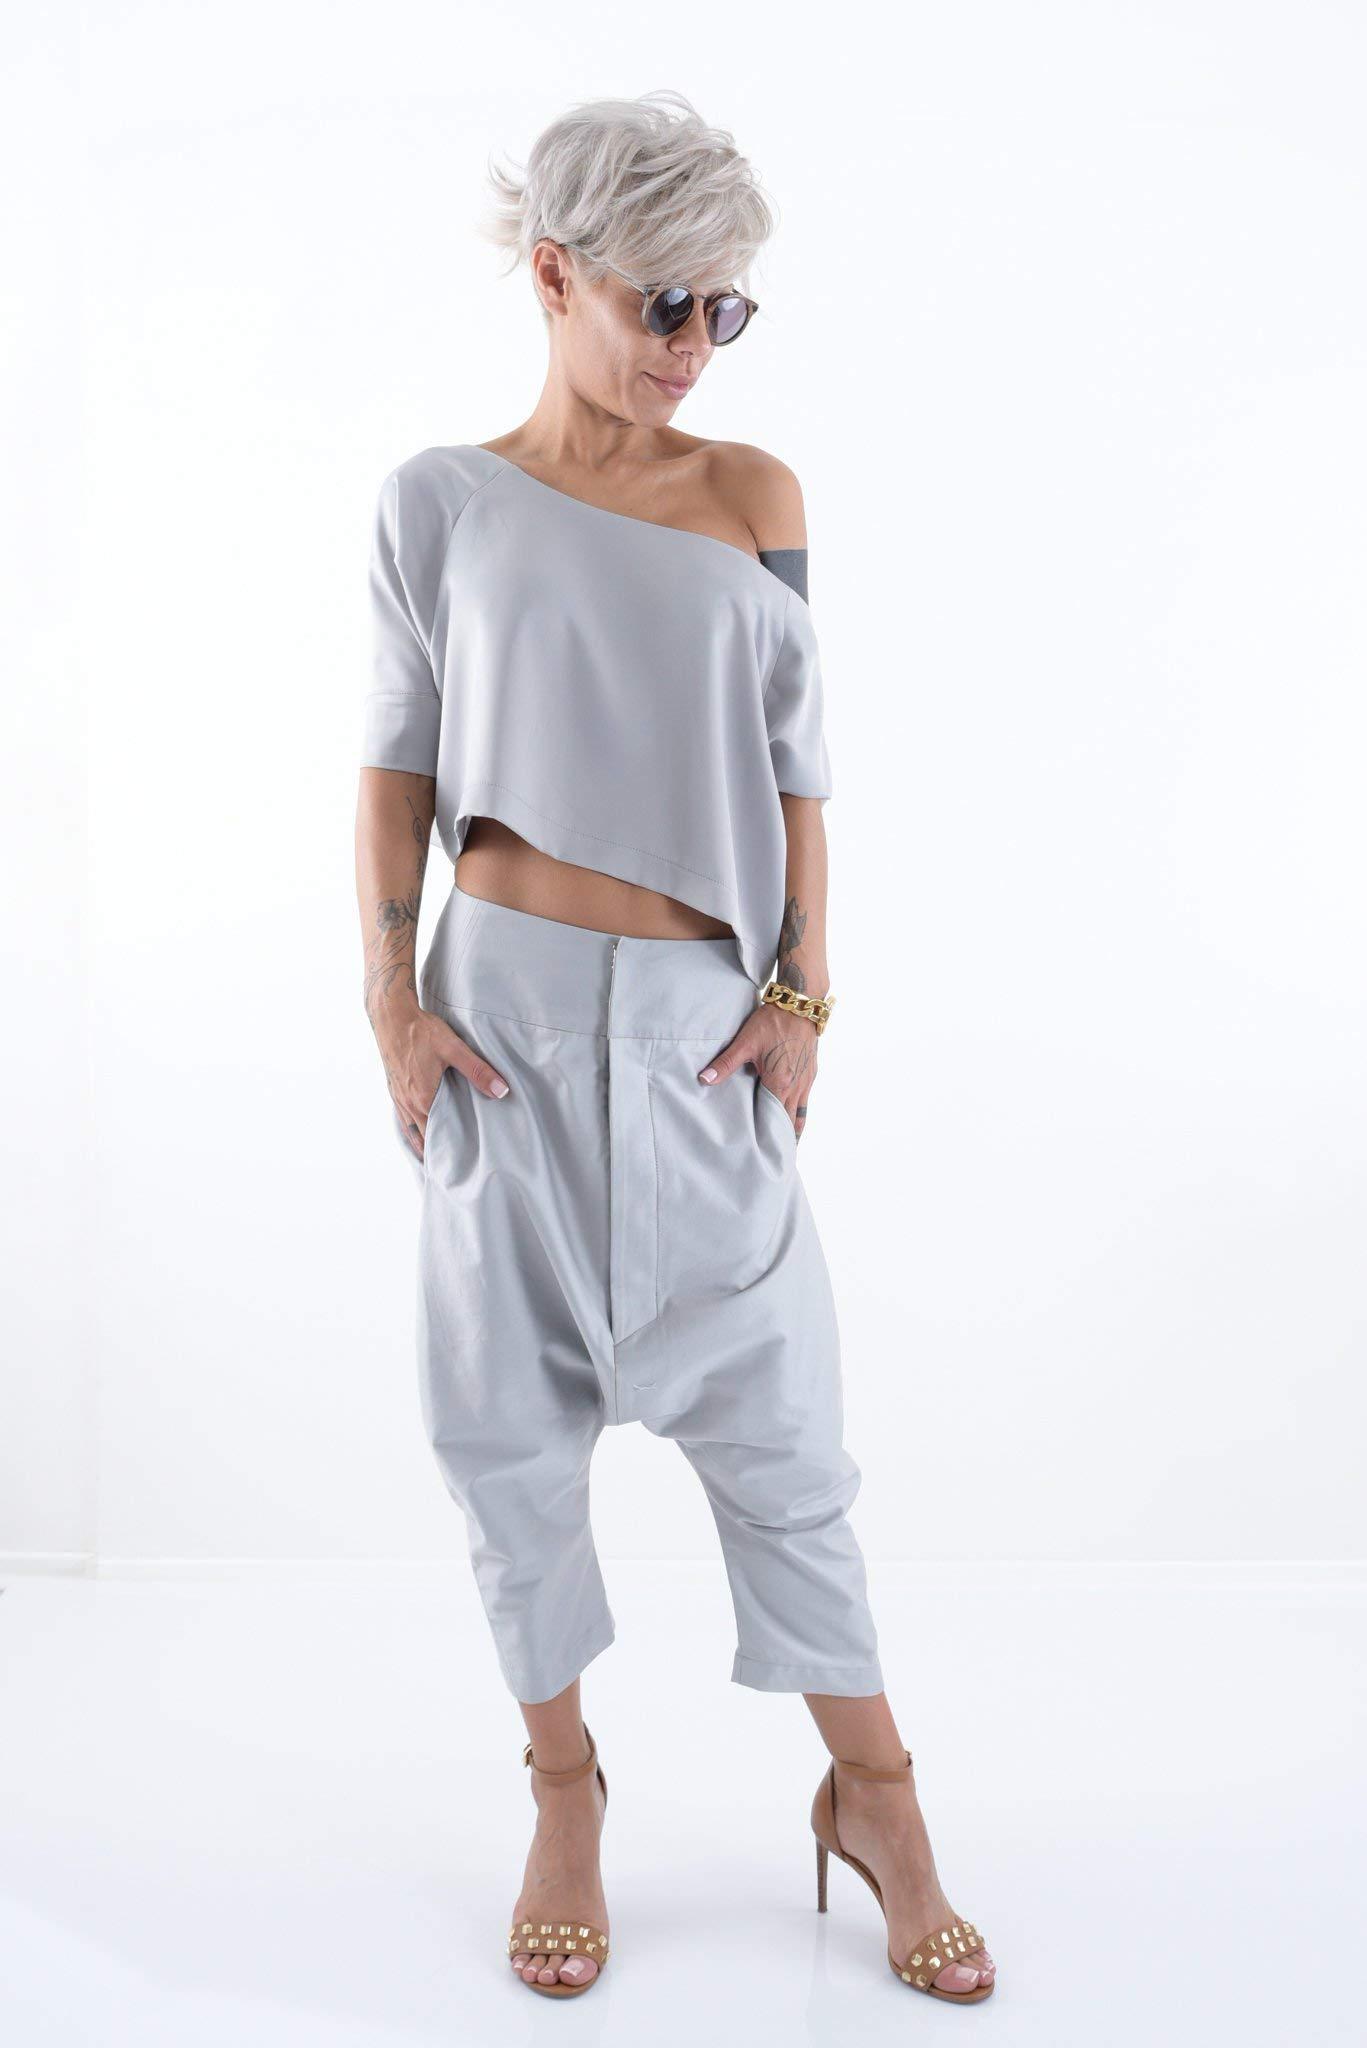 LOCKERROOM Women Wide Leg Loose Harem Boho Trendy Plus Size Pants by Clothes By Locker Room